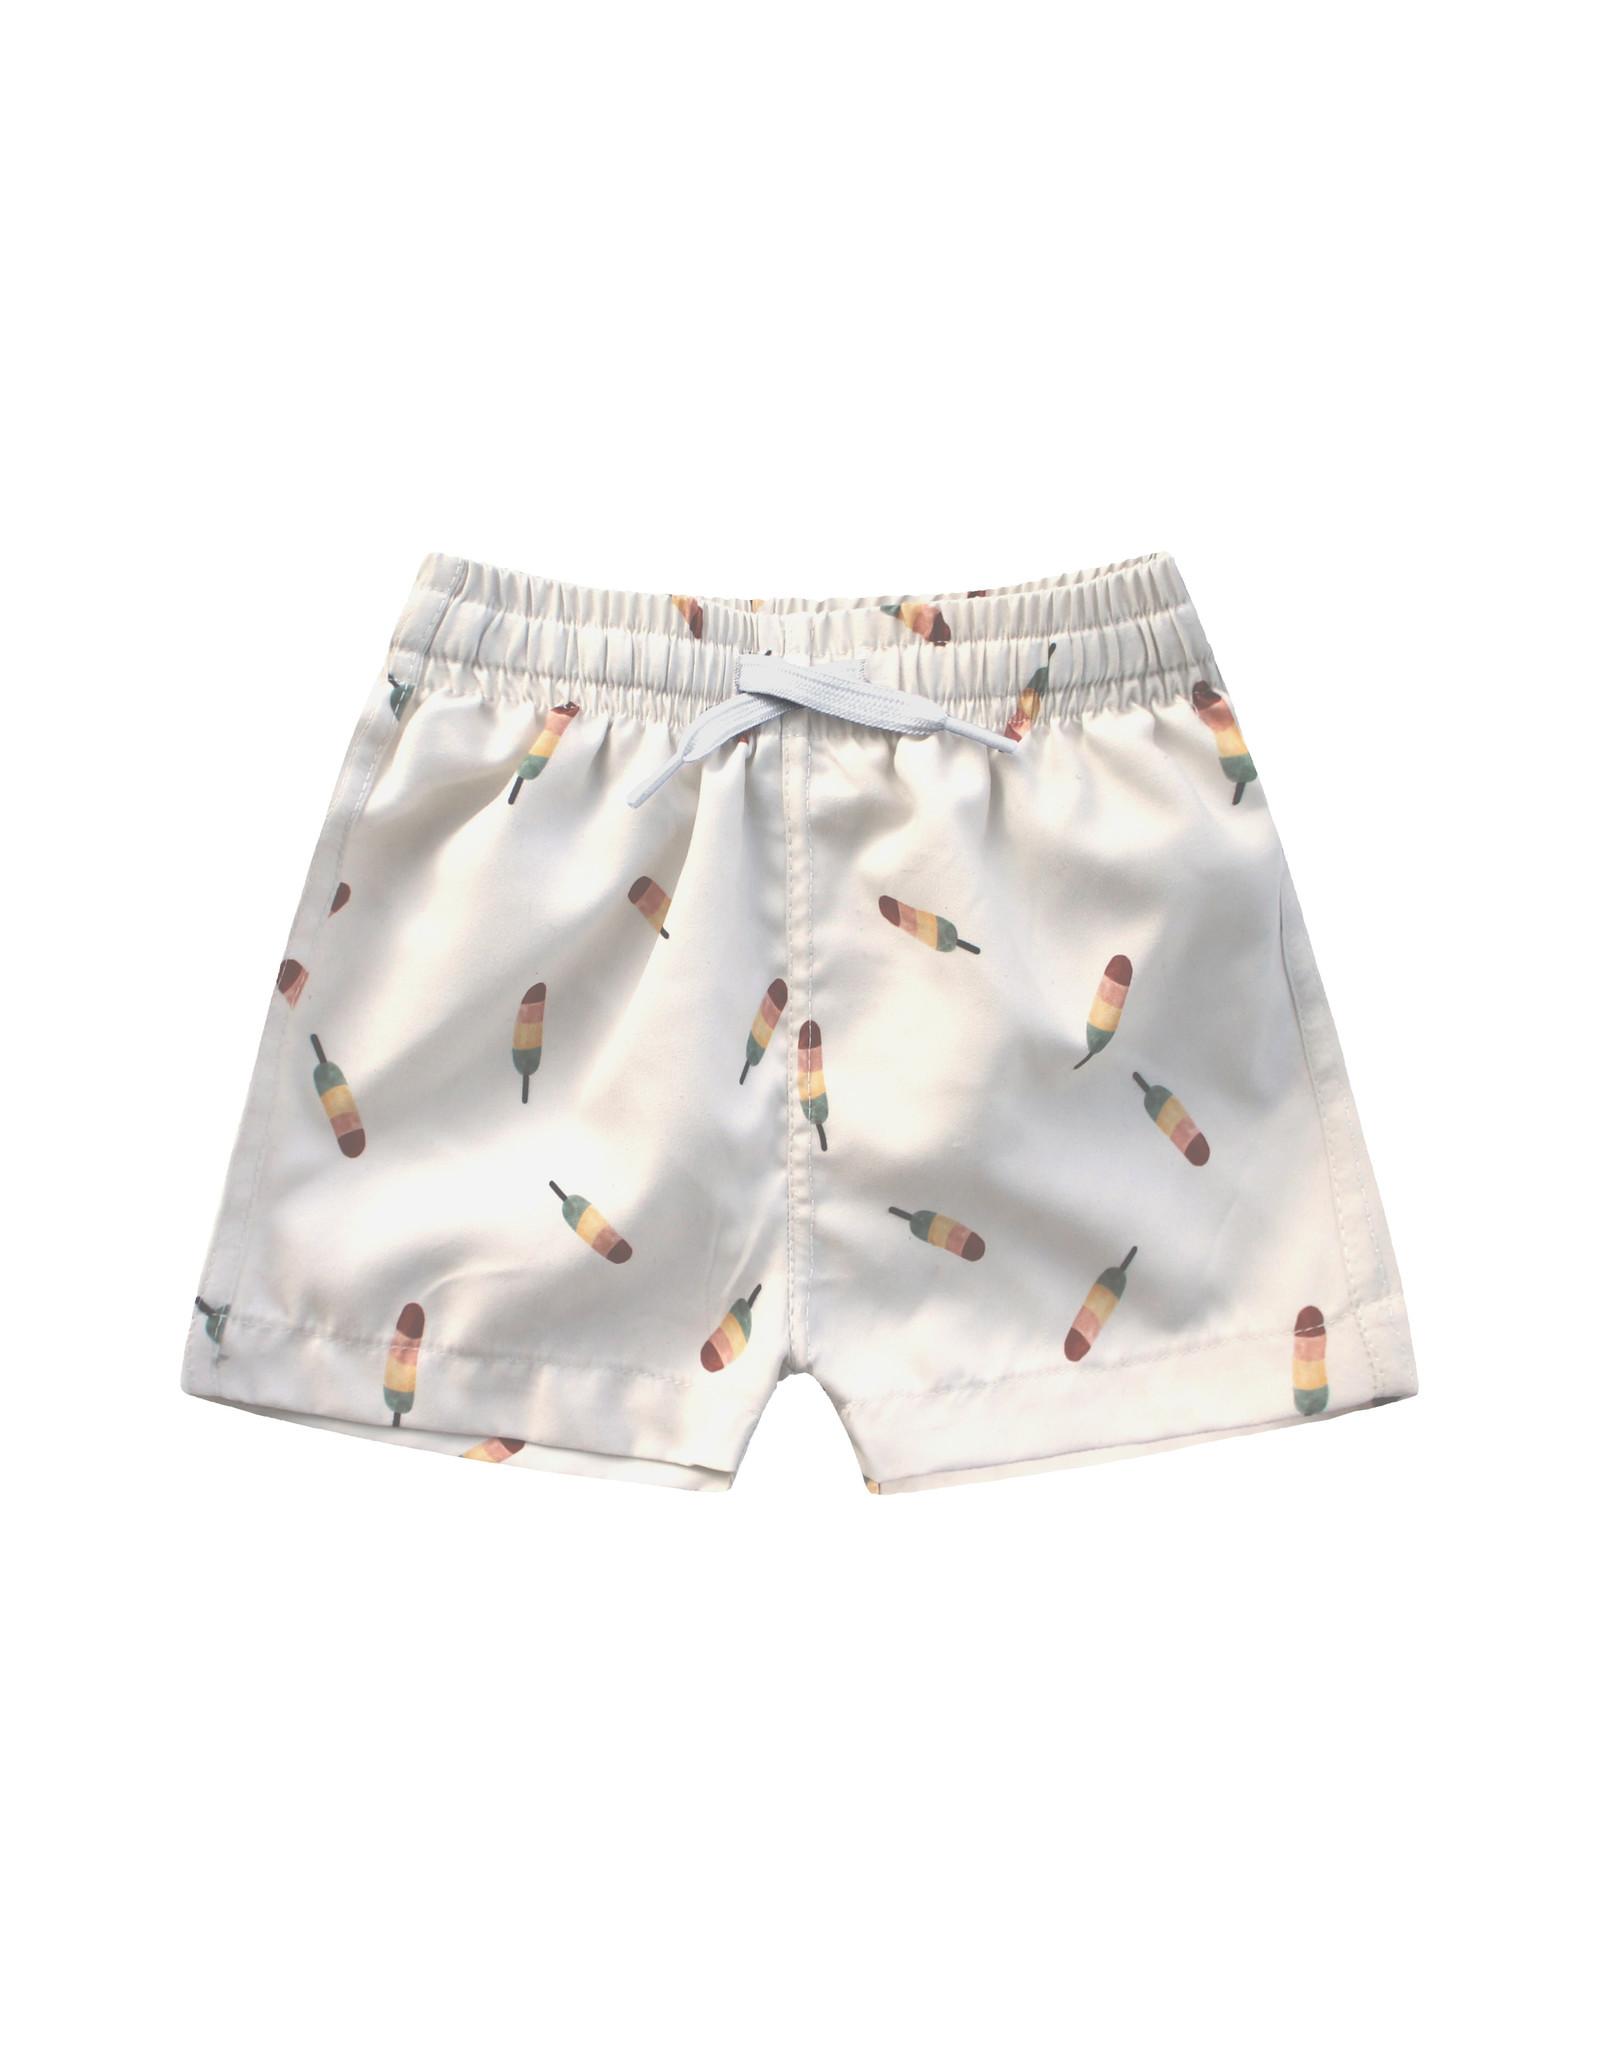 Your Wishes Ice Cream | Swim Shorts Multicolor